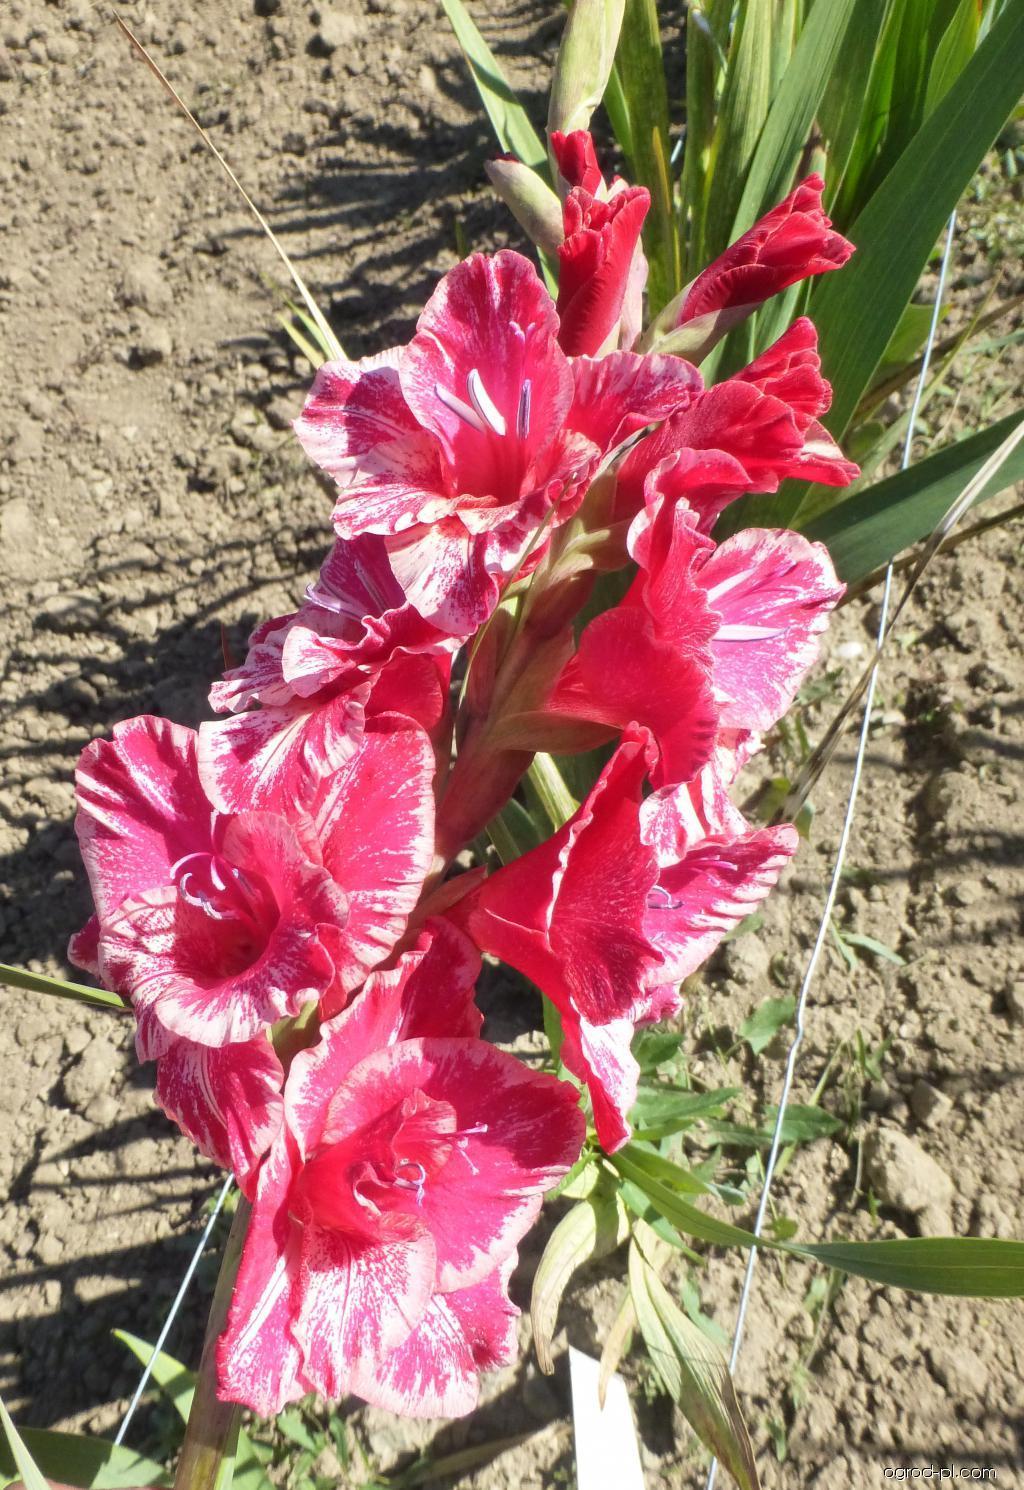 Mečík Rigel Exotic (Gladiolus x hybridus)